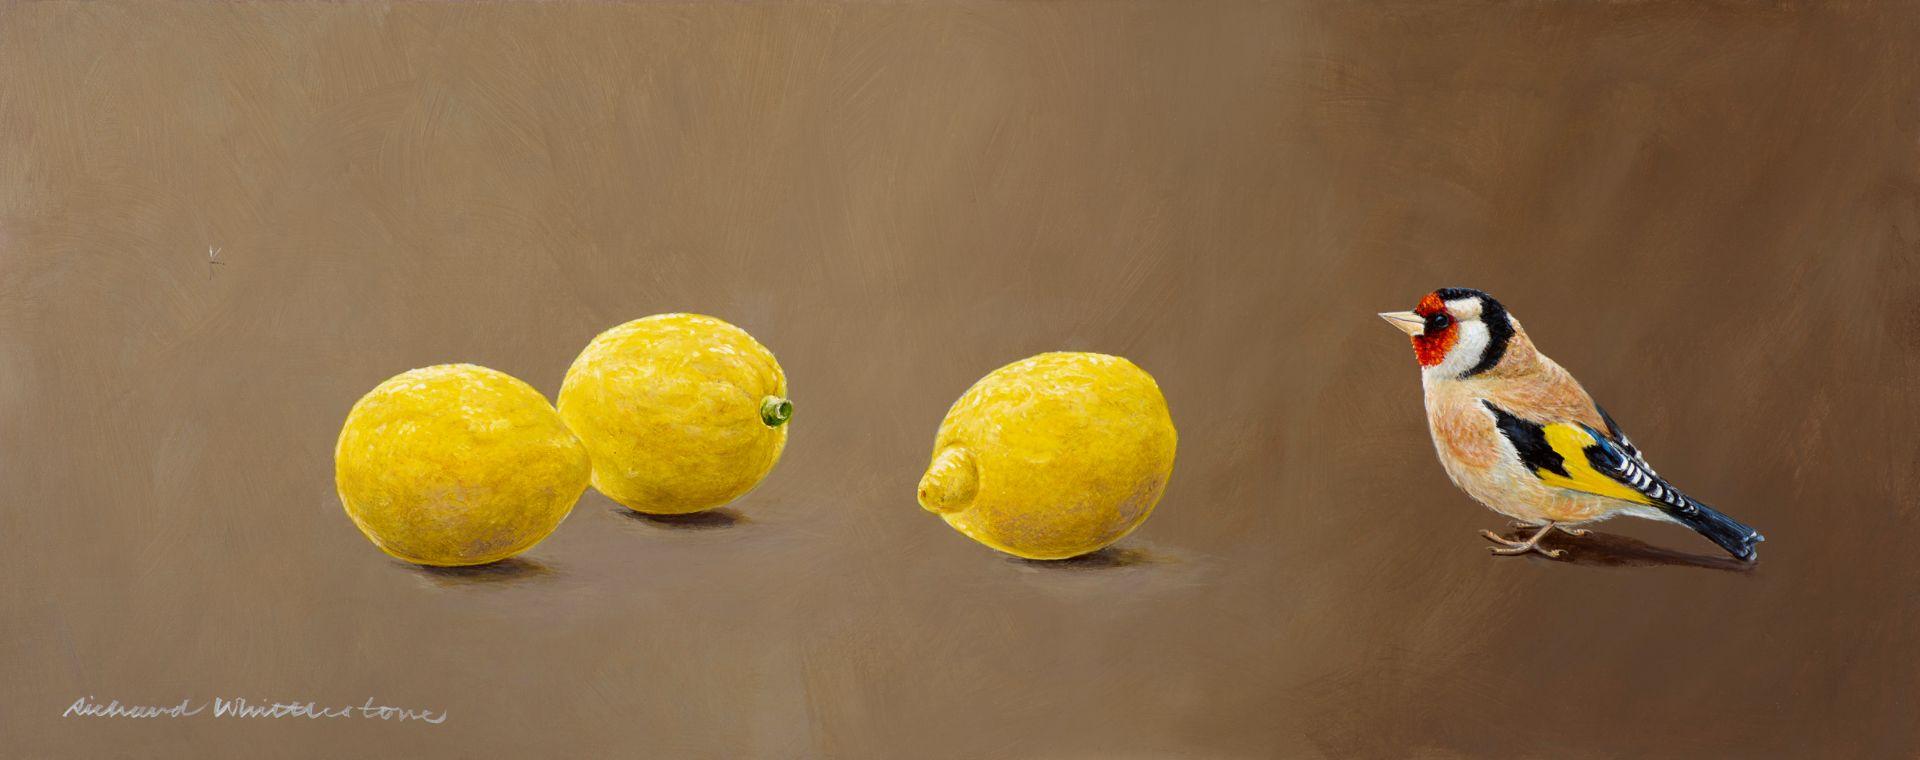 Richard-Whittlestone-Prints-Goldfinch-wi